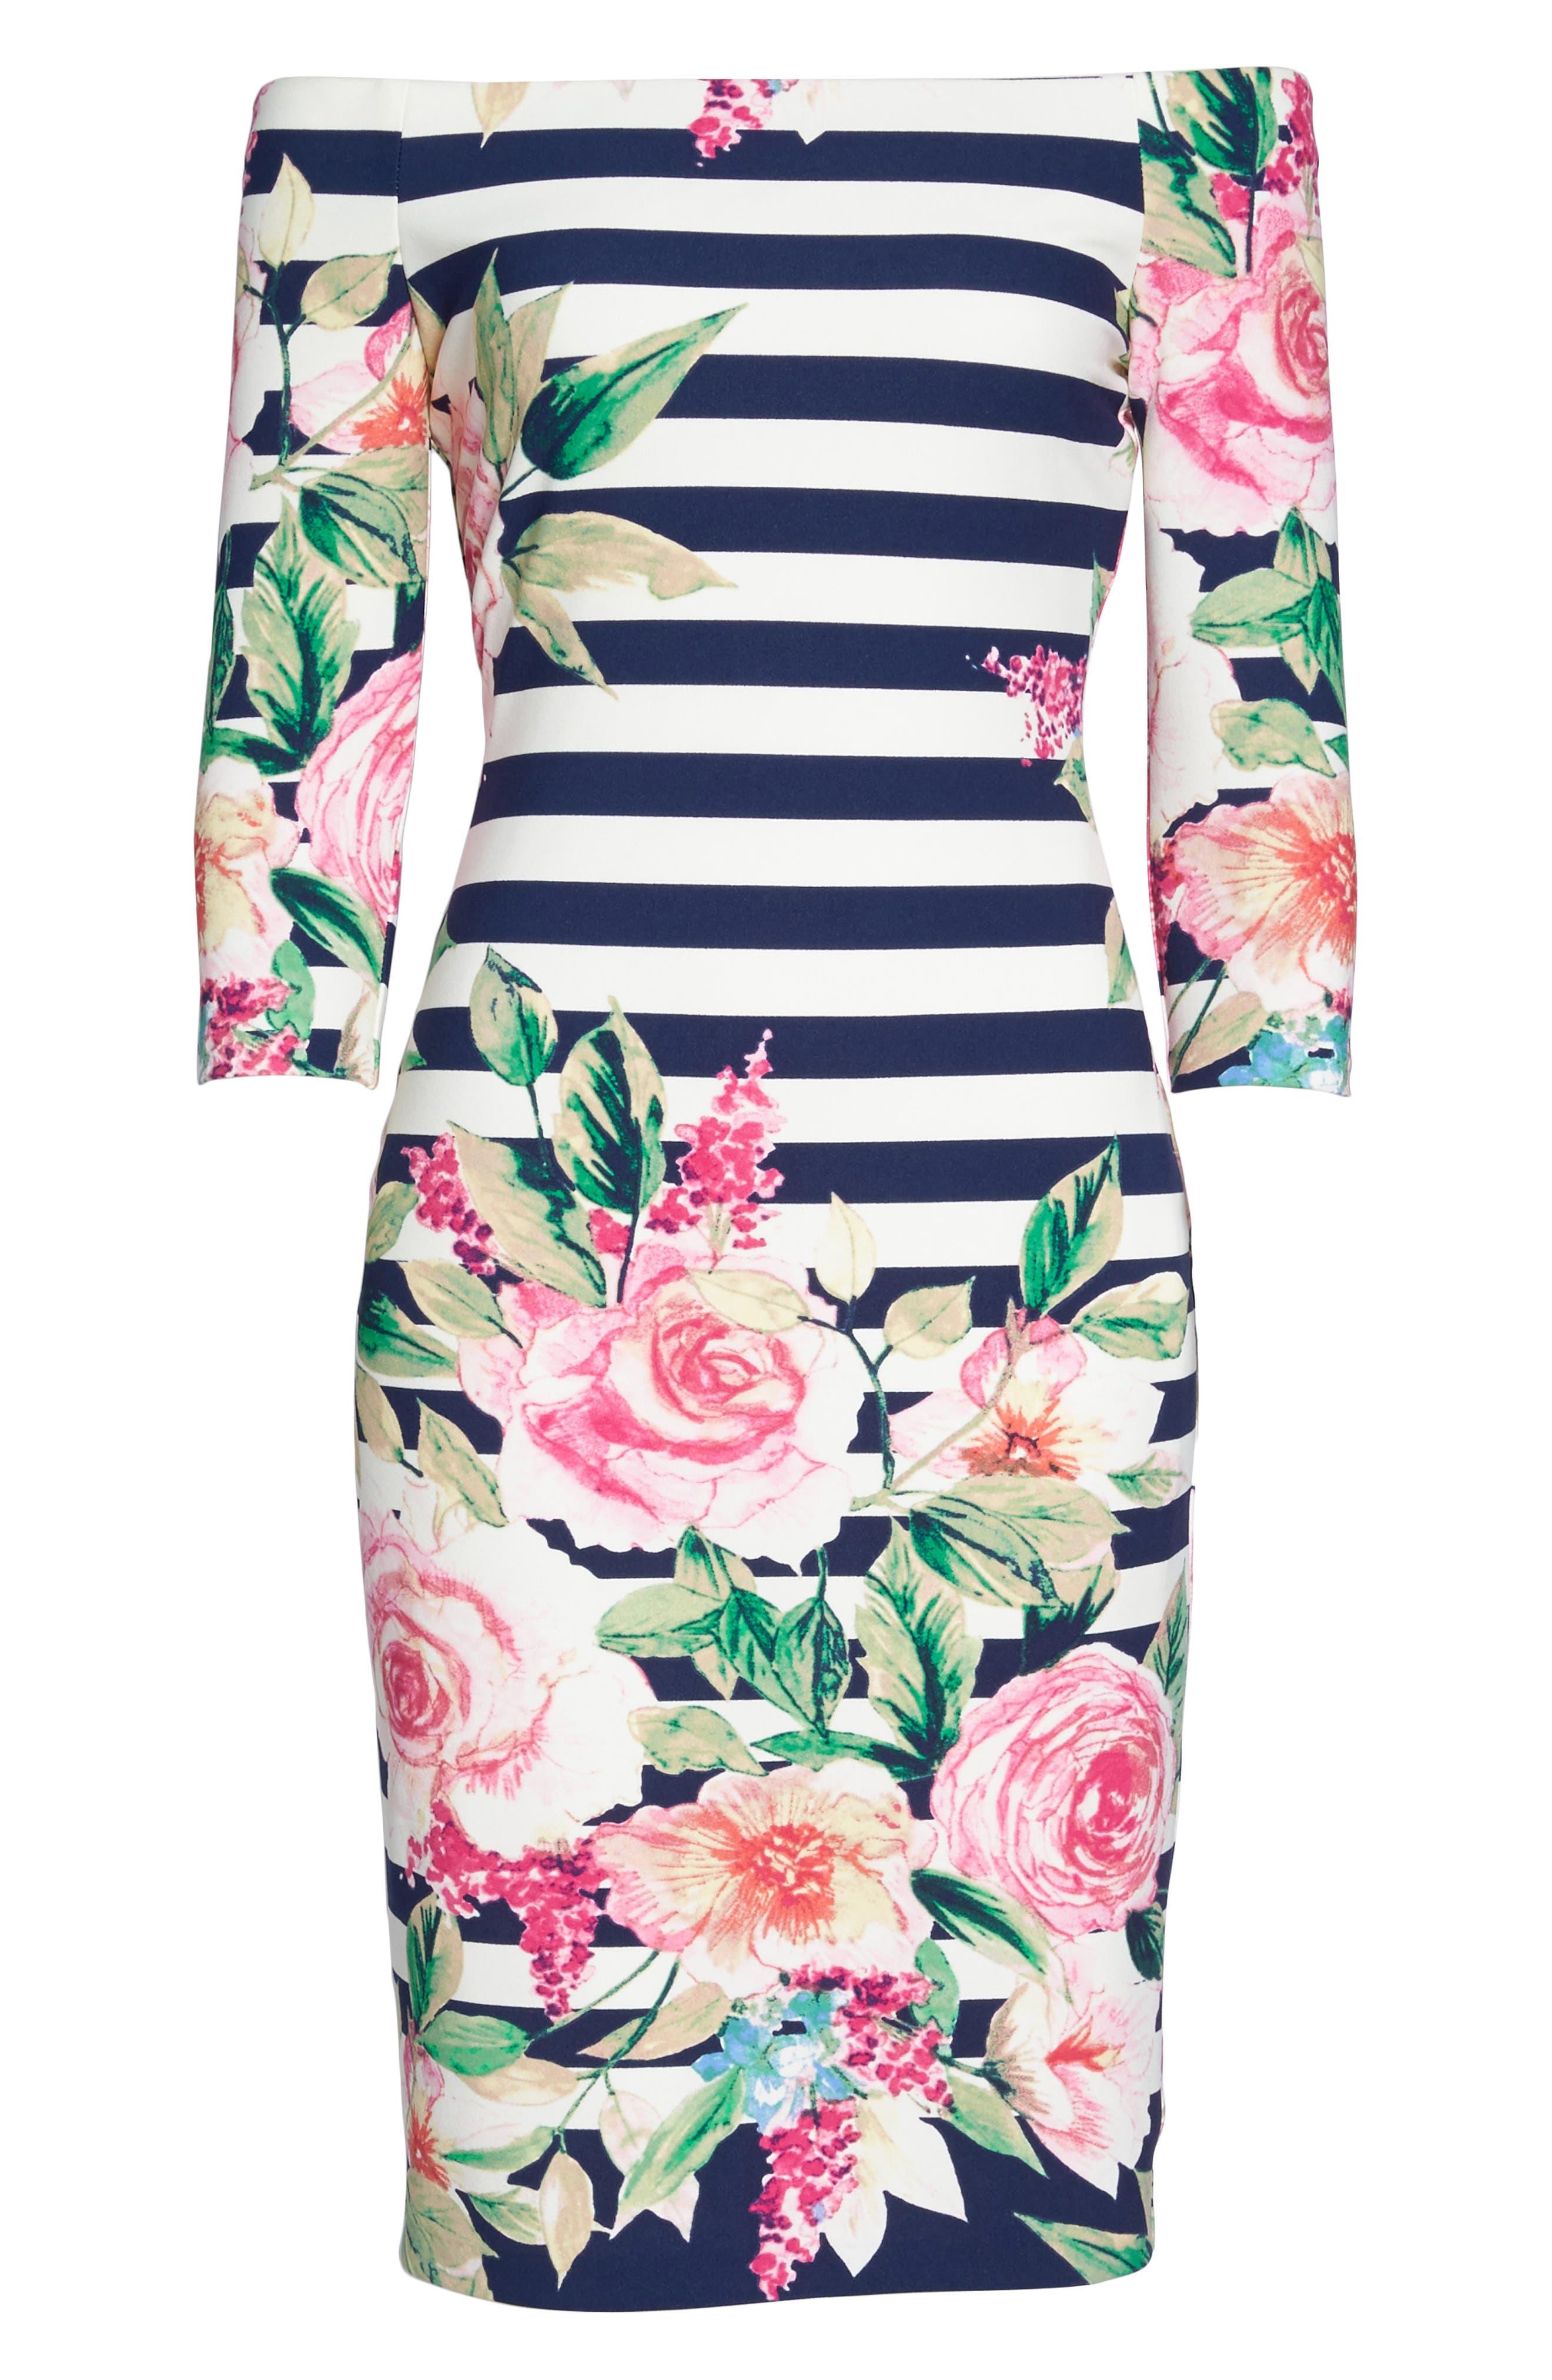 Stripe Off the Shoulder Dress,                             Alternate thumbnail 6, color,                             470